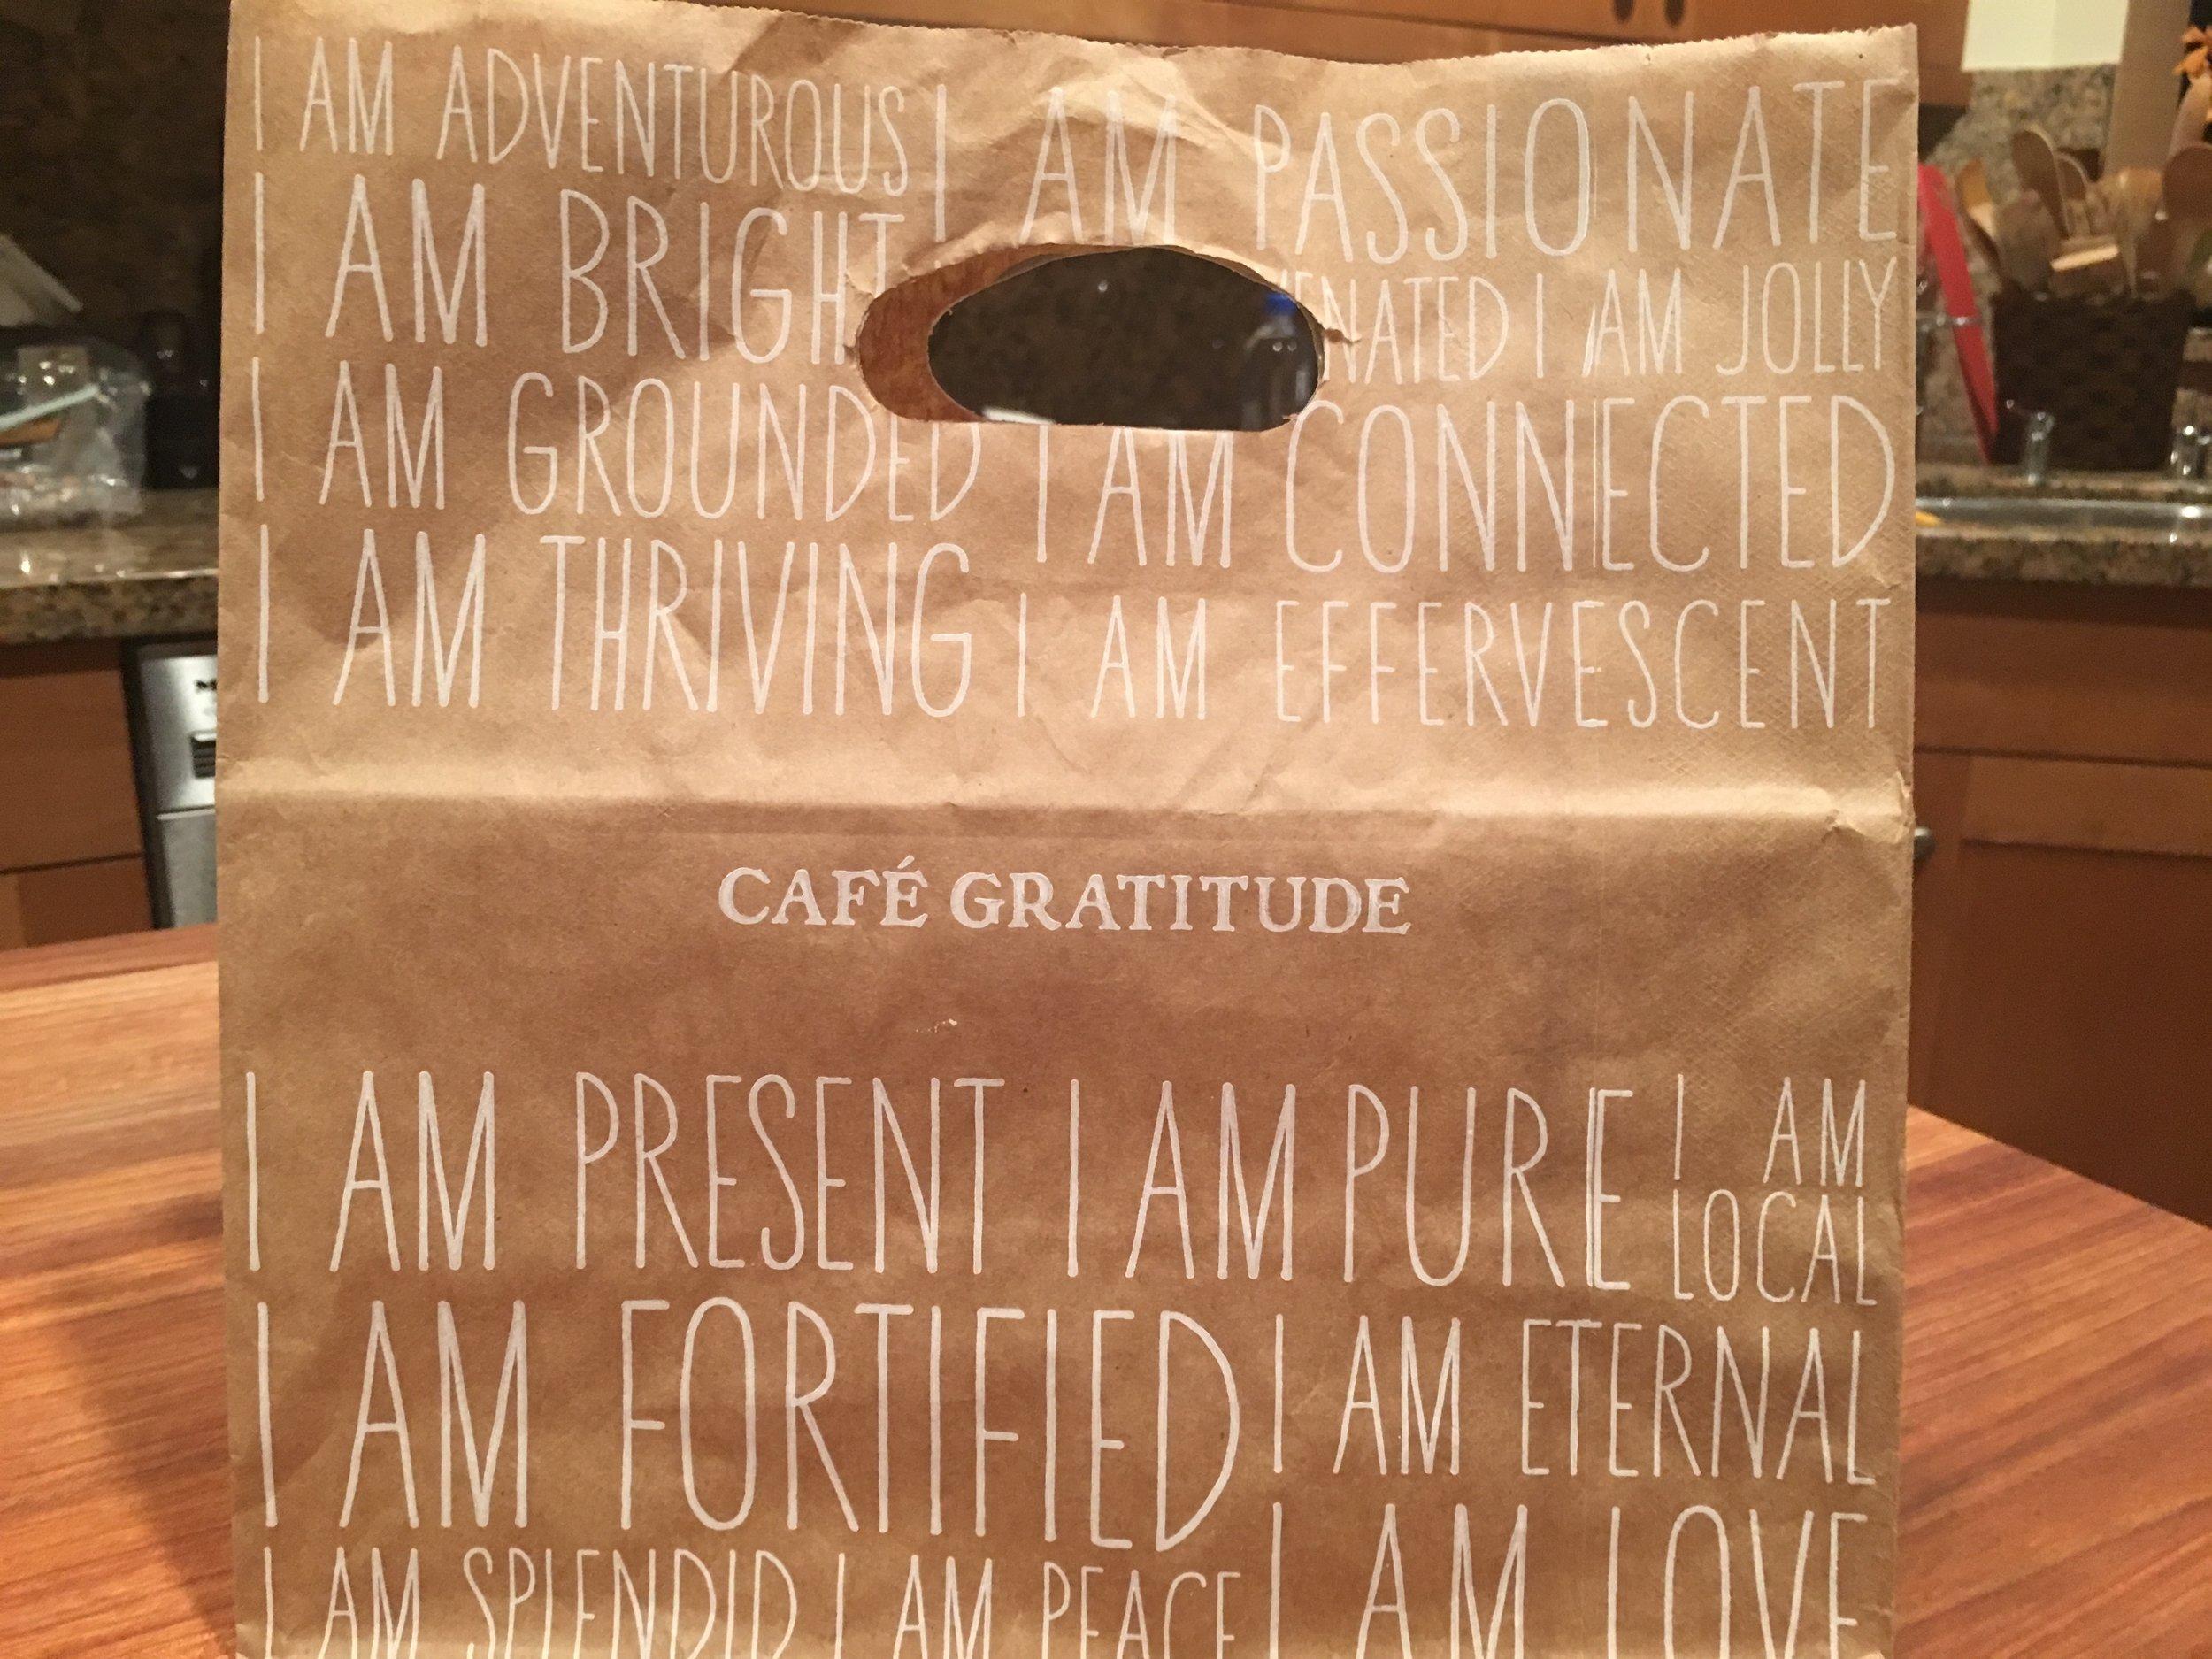 Kudos to Cafe Gratitude Beverly Hills for their inspiring to-go bags!